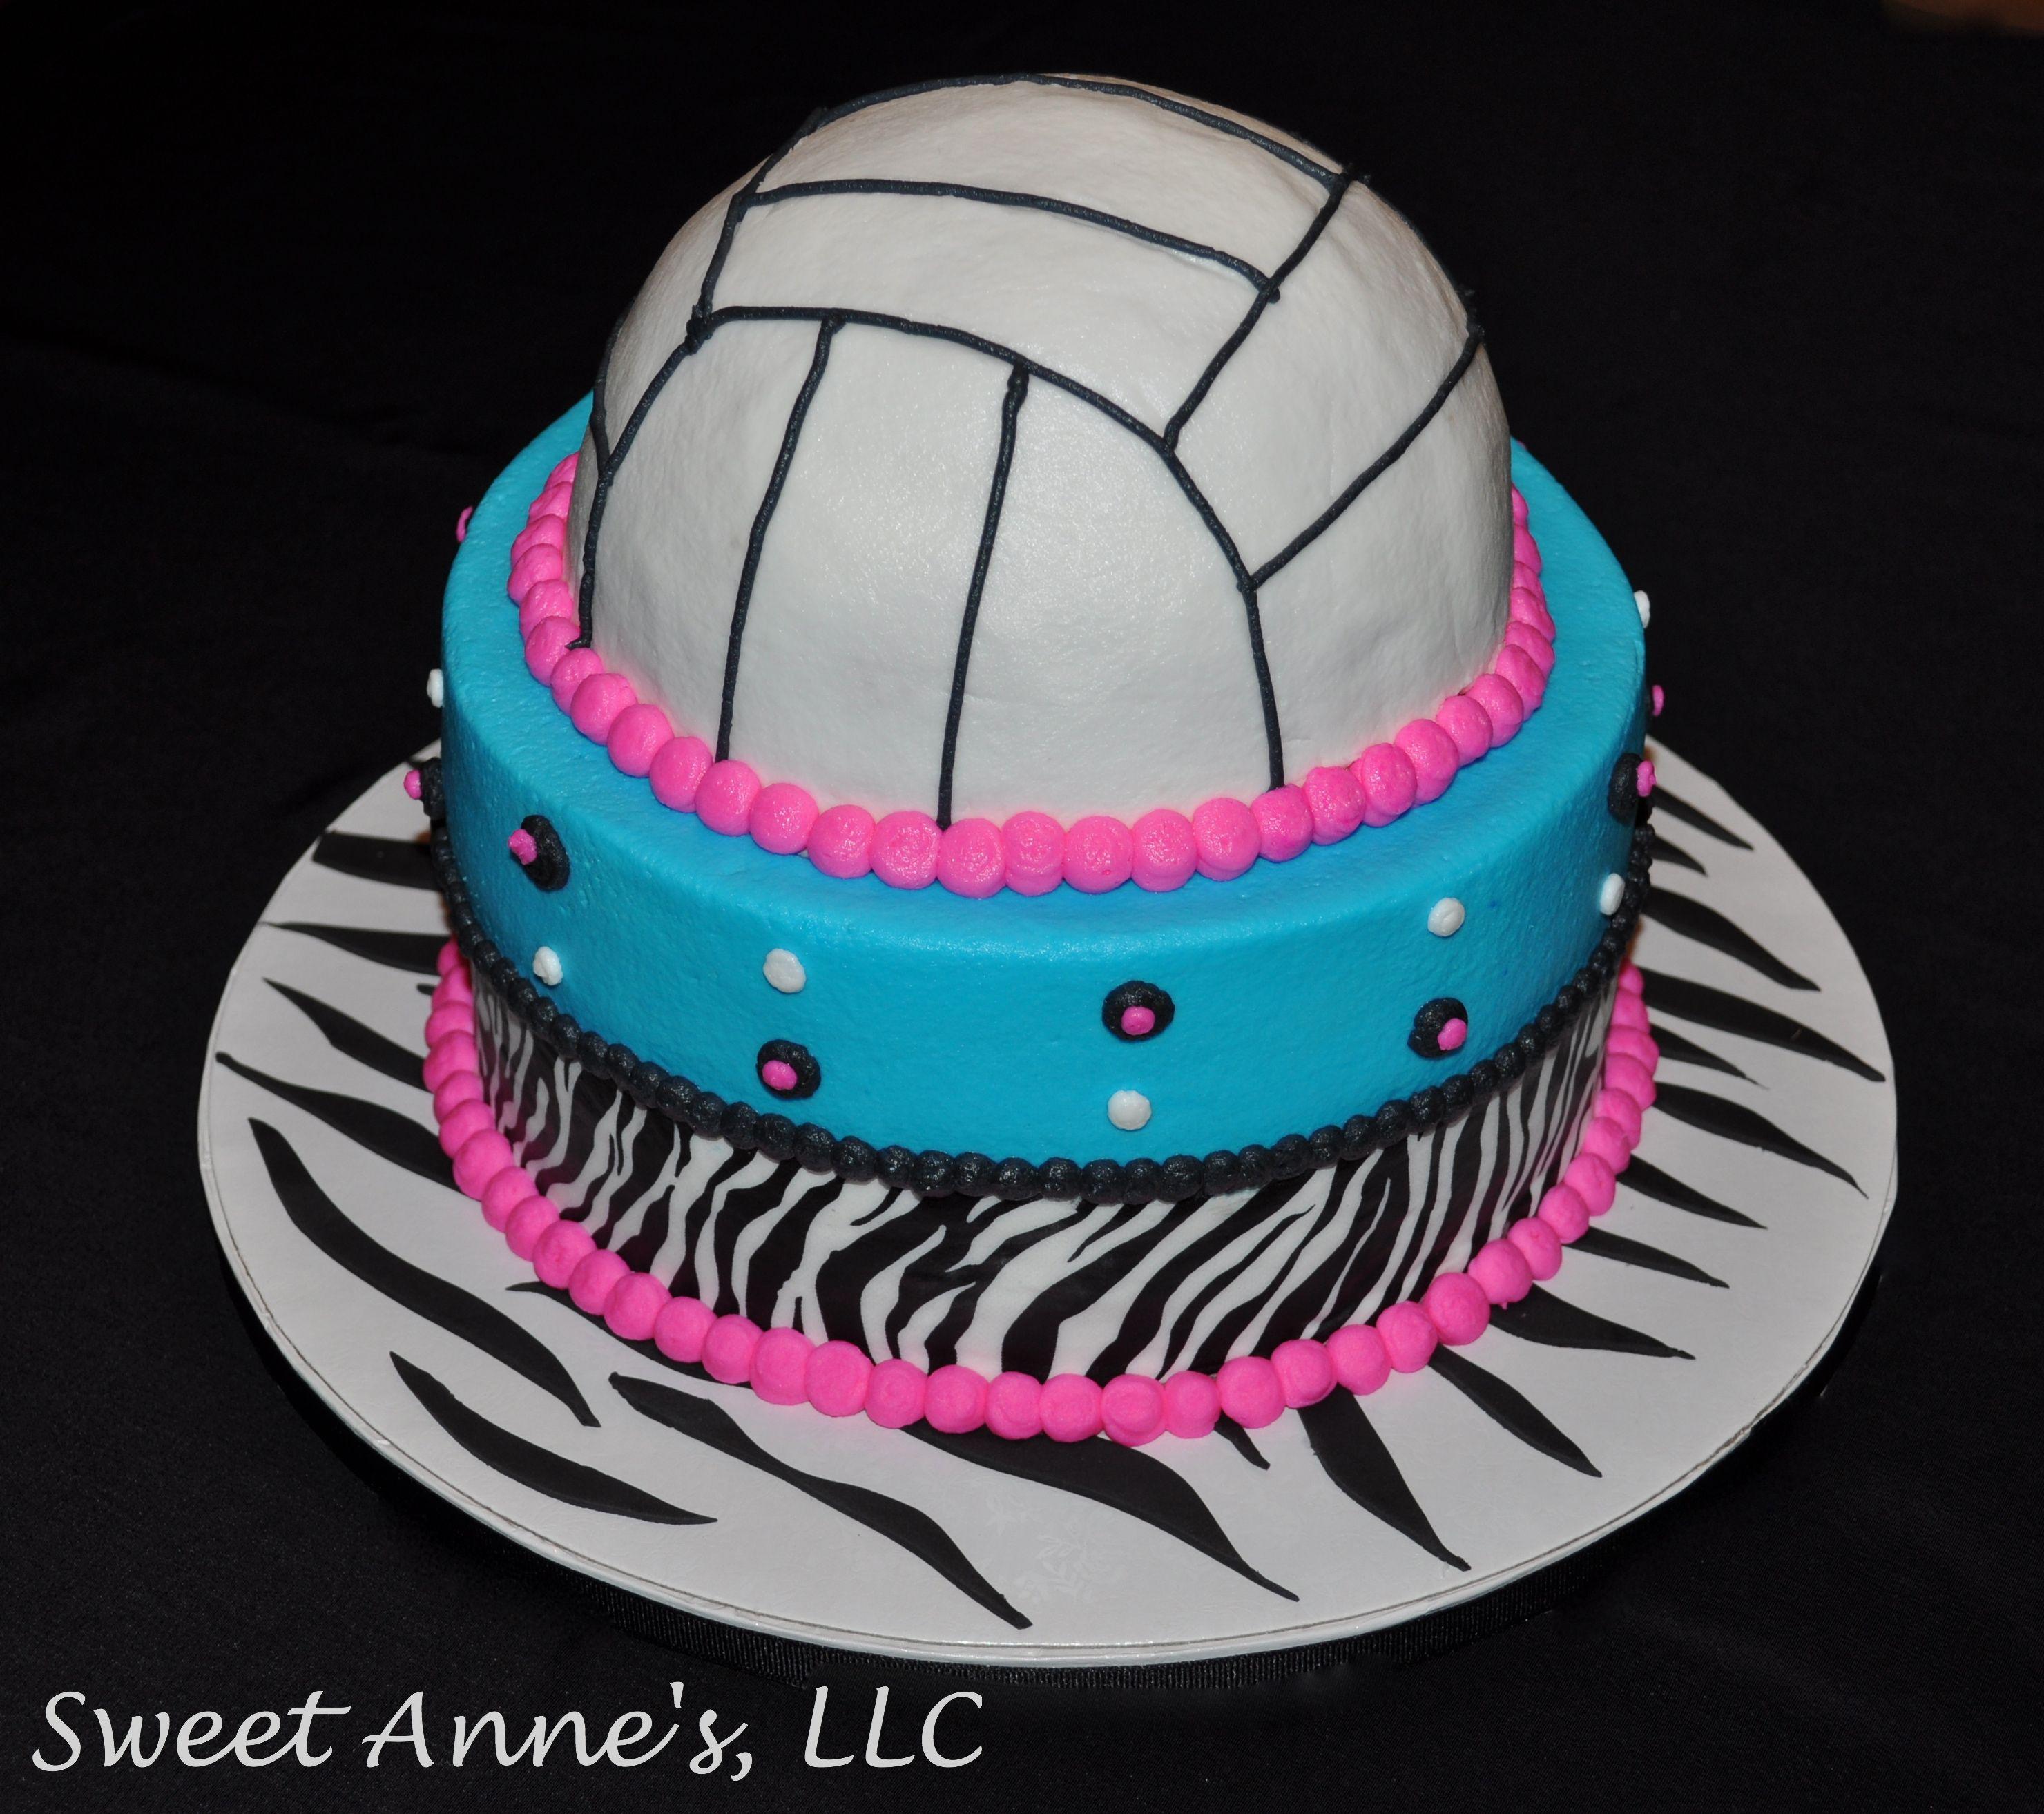 Volleyball Birthday Volleyball Volleyball Cakes Volleyball Birthday Cakes Volleyball